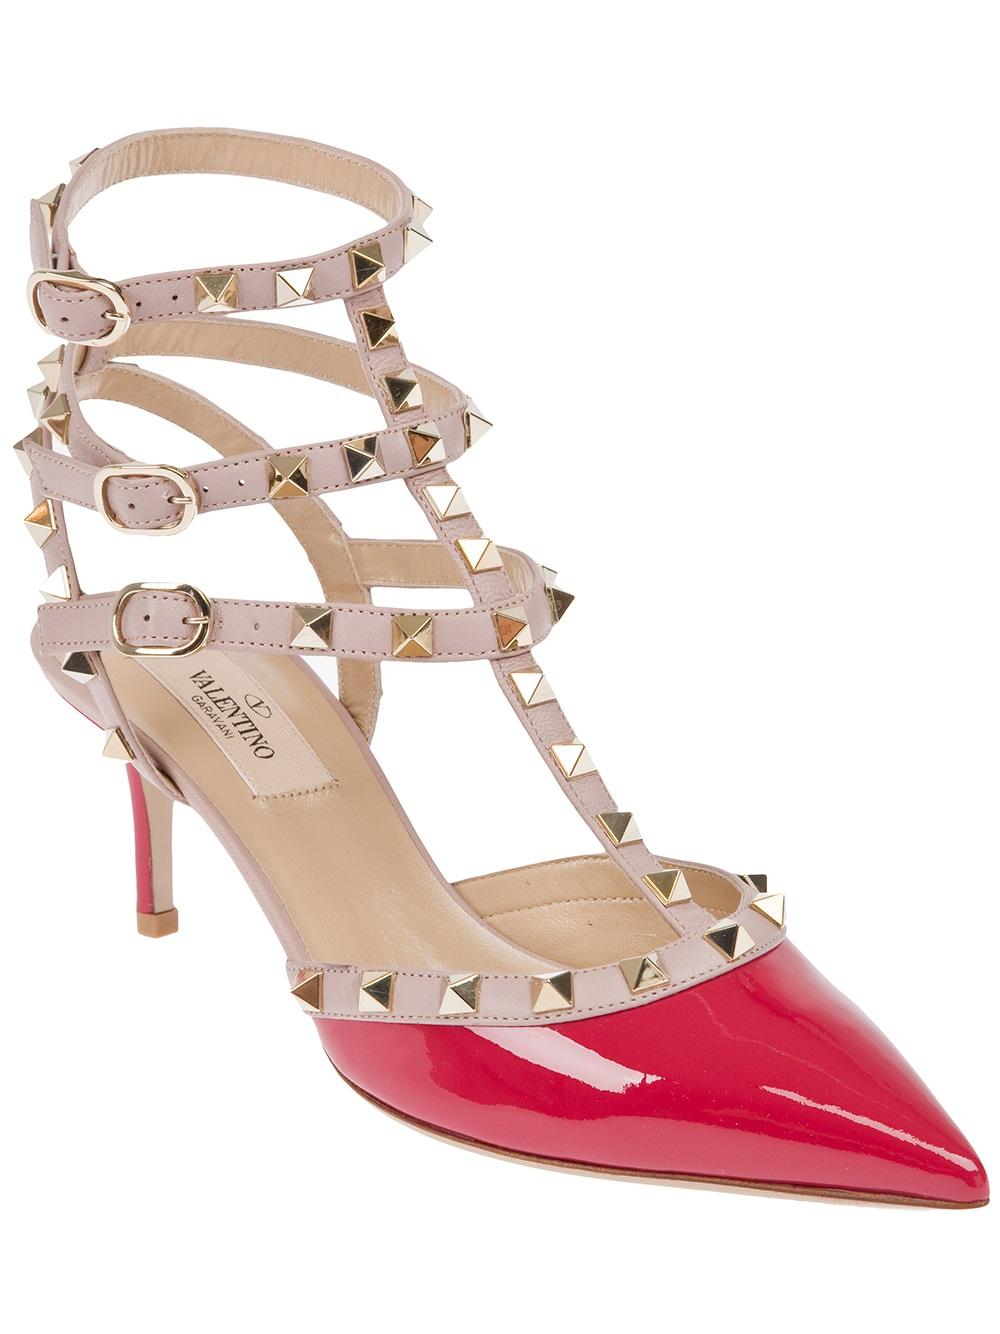 c046aa5ef87 Lyst - Valentino Valentino Rockstud Ankle Strap Pump in Pink